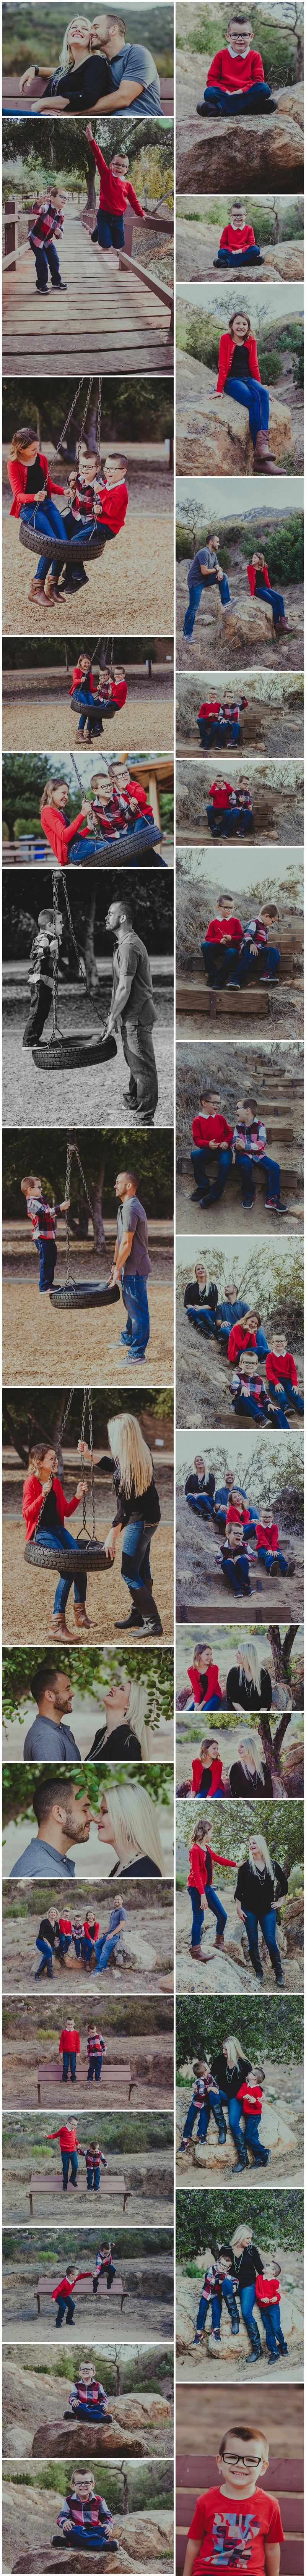 martellgannonfamily